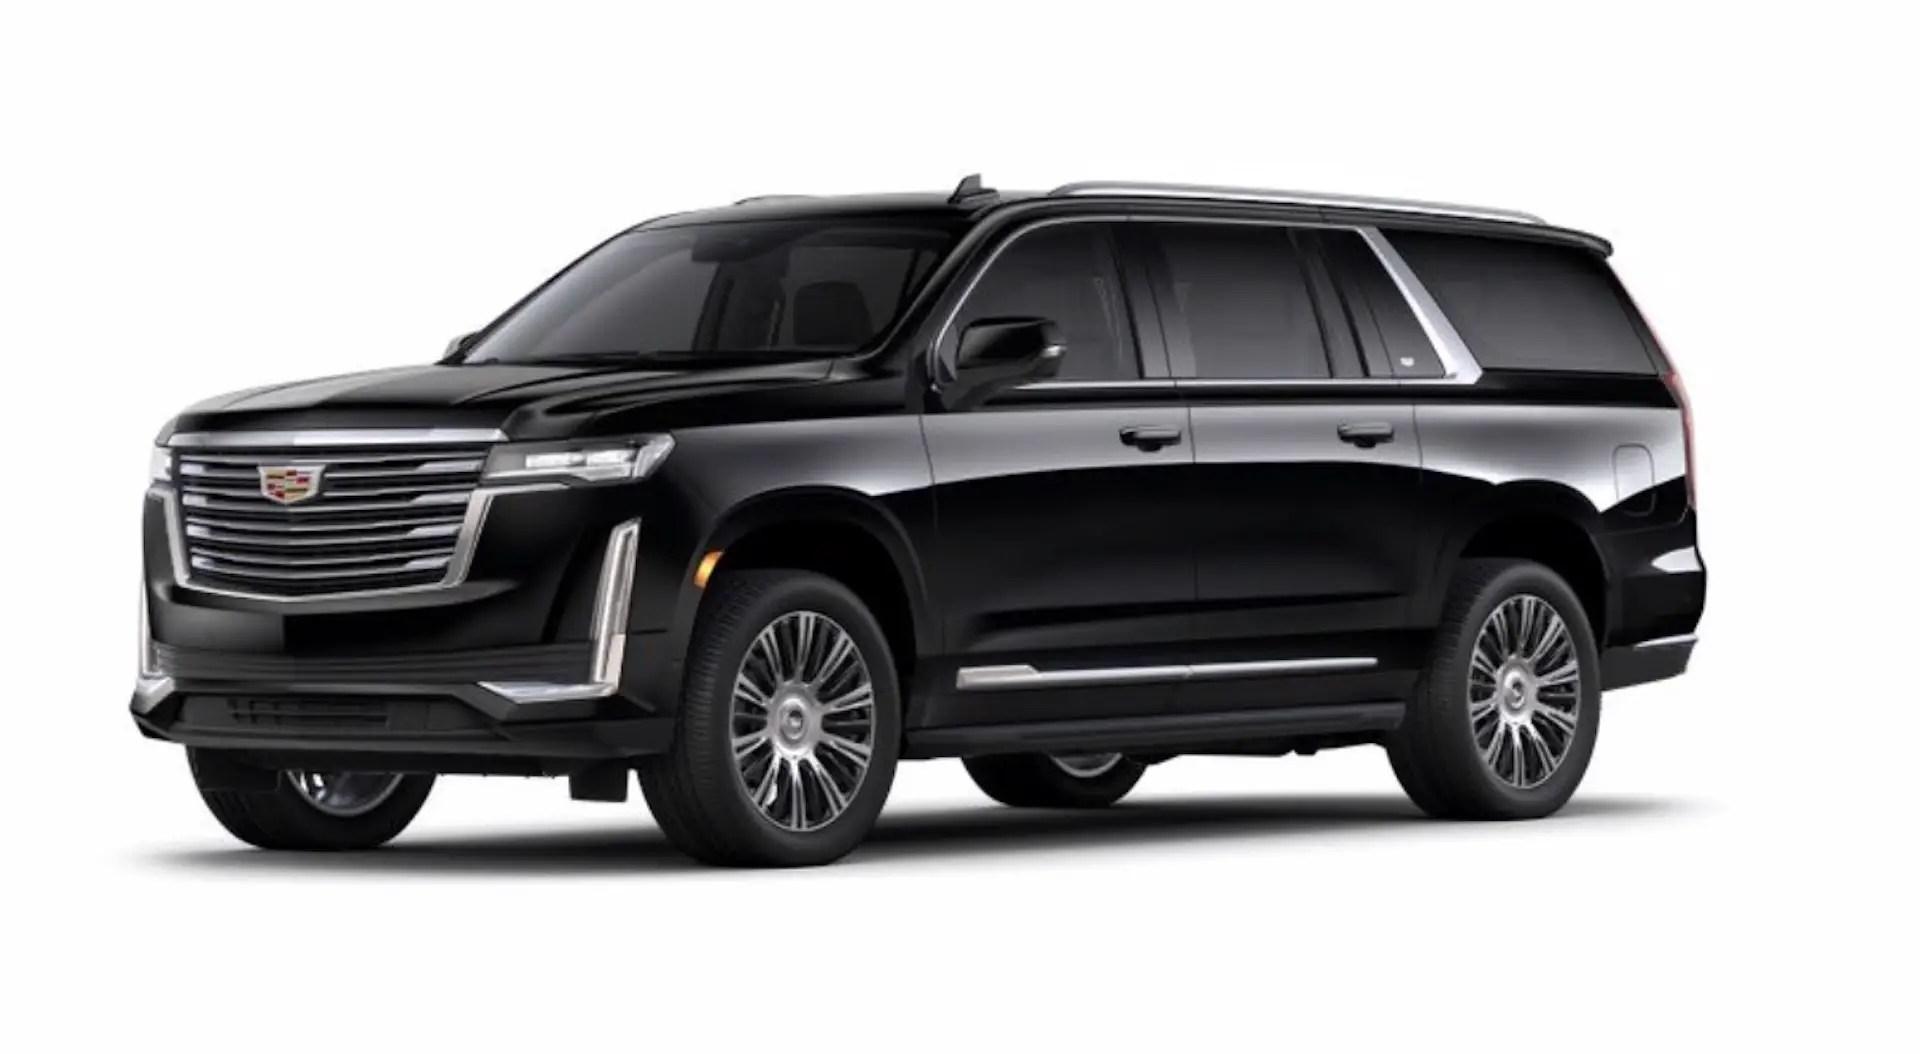 Most Expensive 2021 Cadillac Escalade Tops $115,000